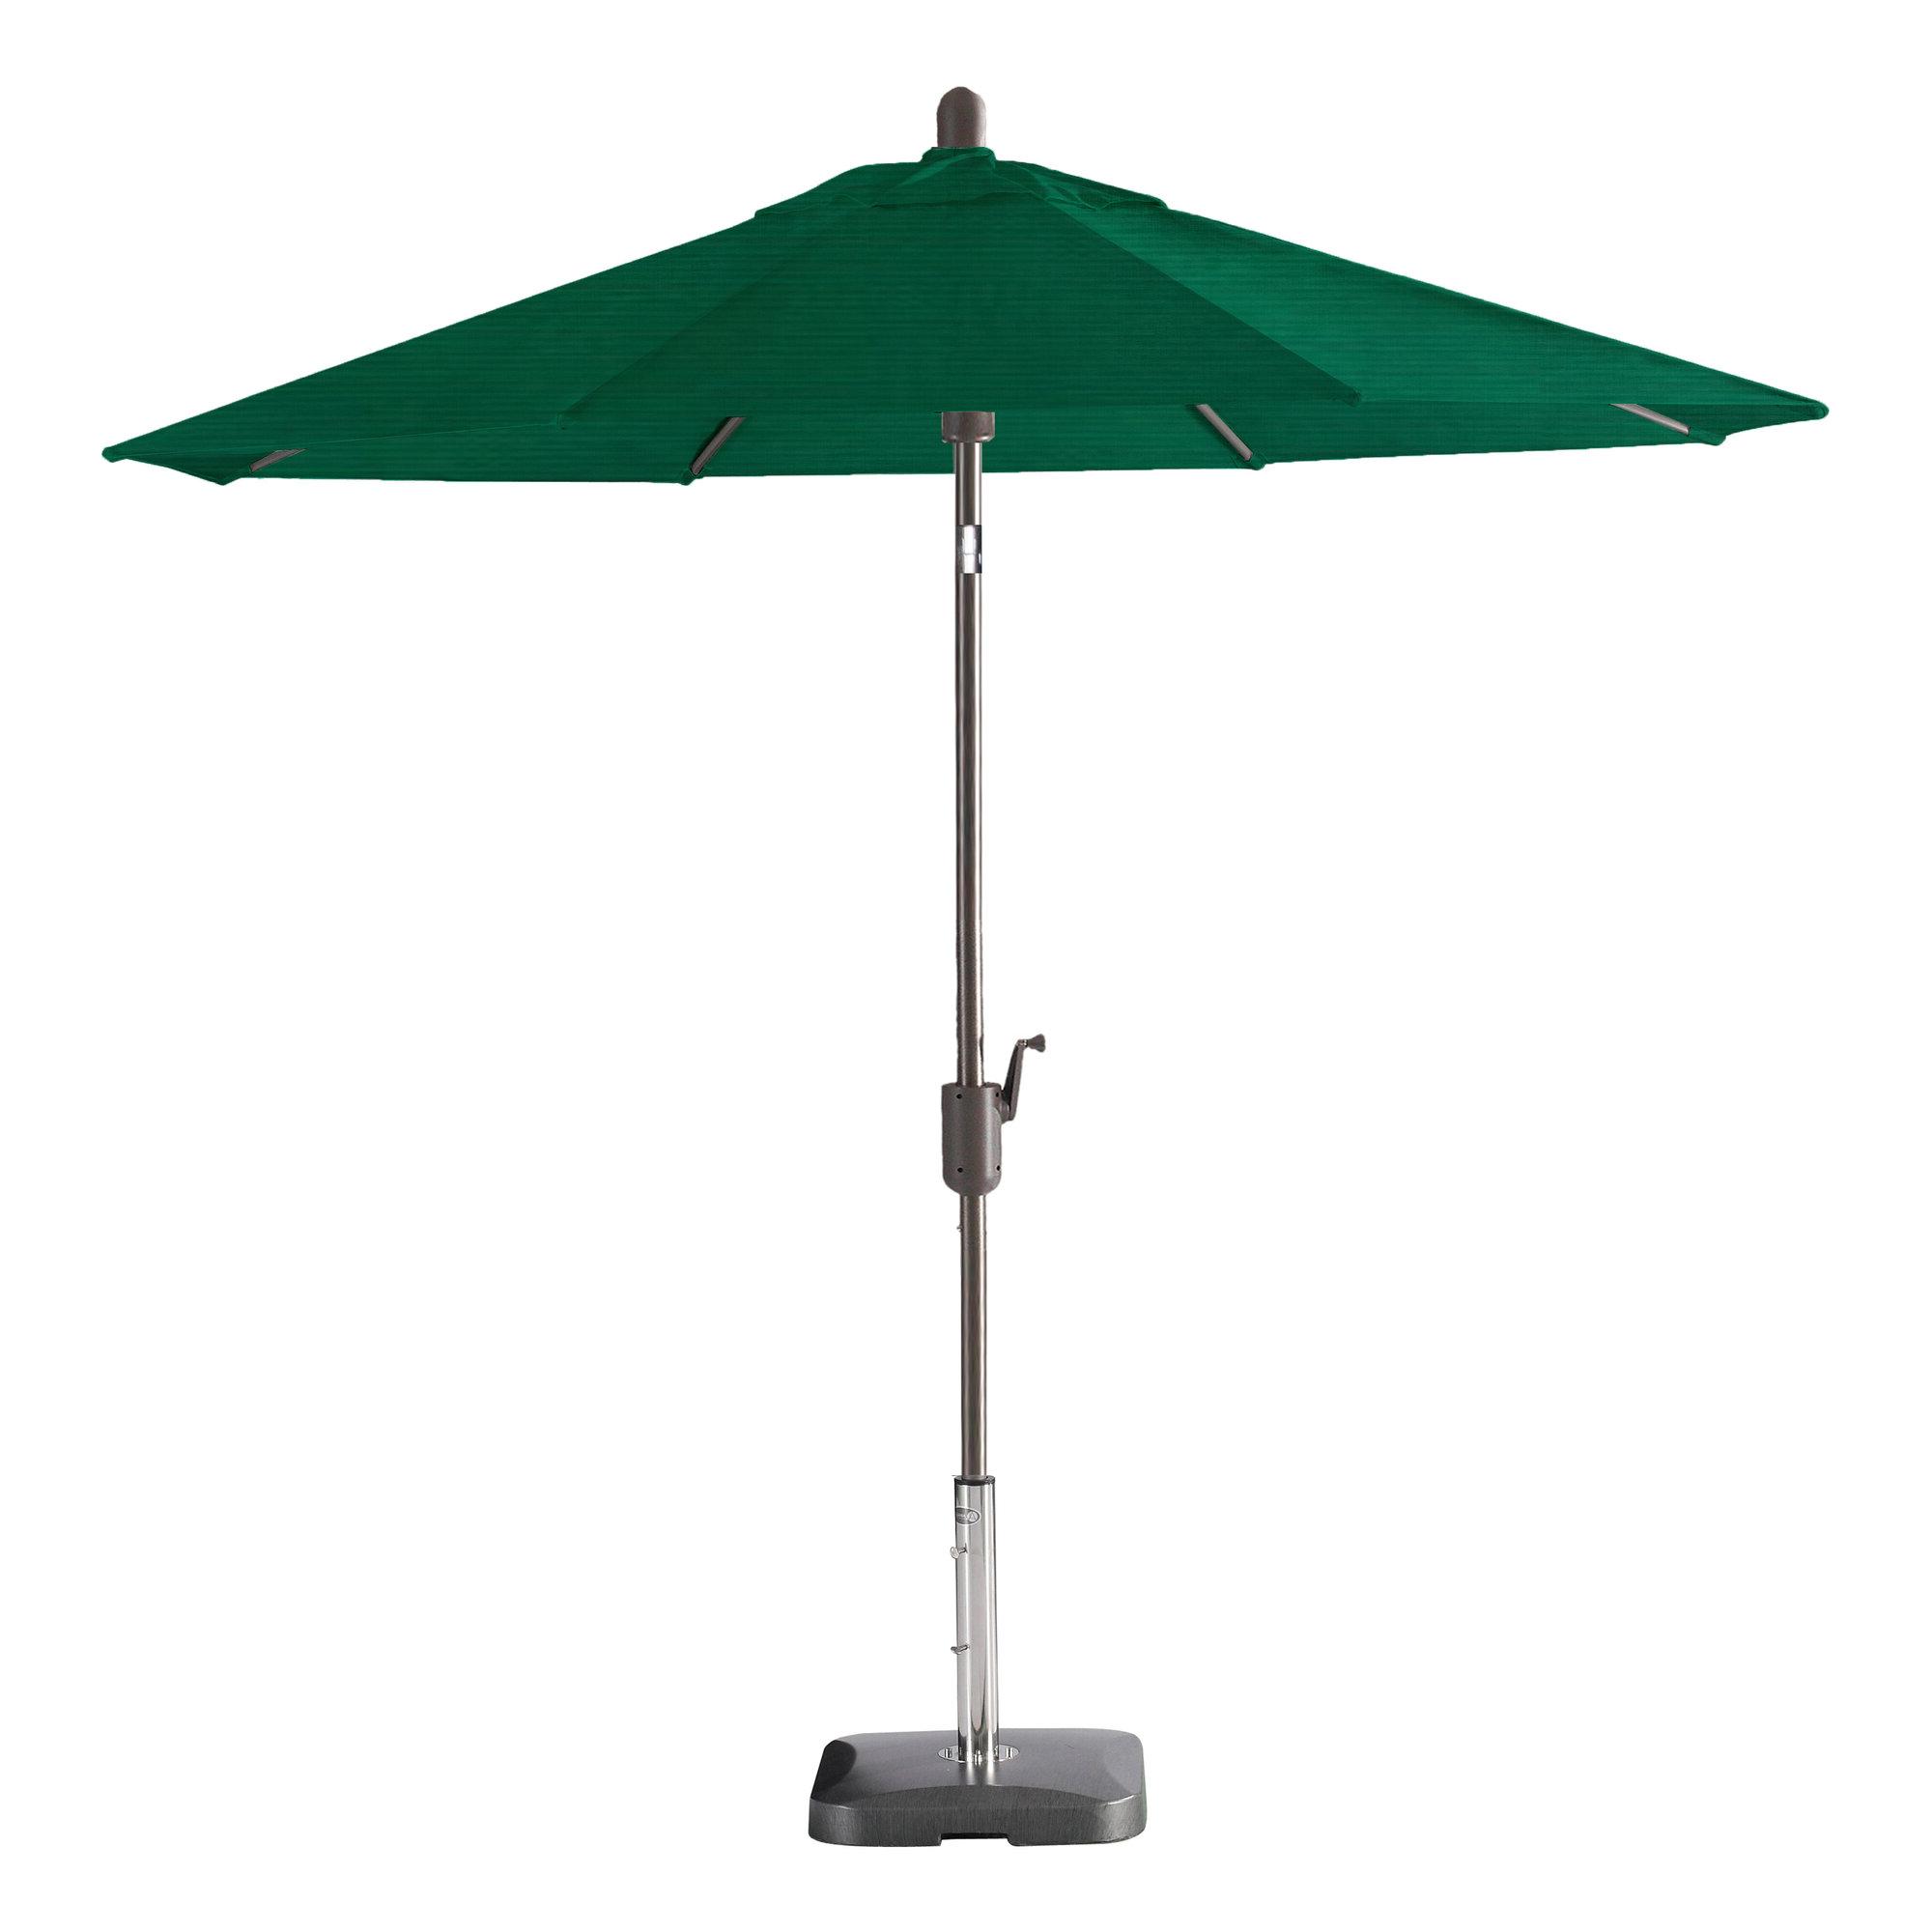 Details About Breakwater Bay Wiechmann 9' Market Sunbrella Umbrella Regarding Famous Wiechmann Market Sunbrella Umbrellas (Gallery 3 of 20)